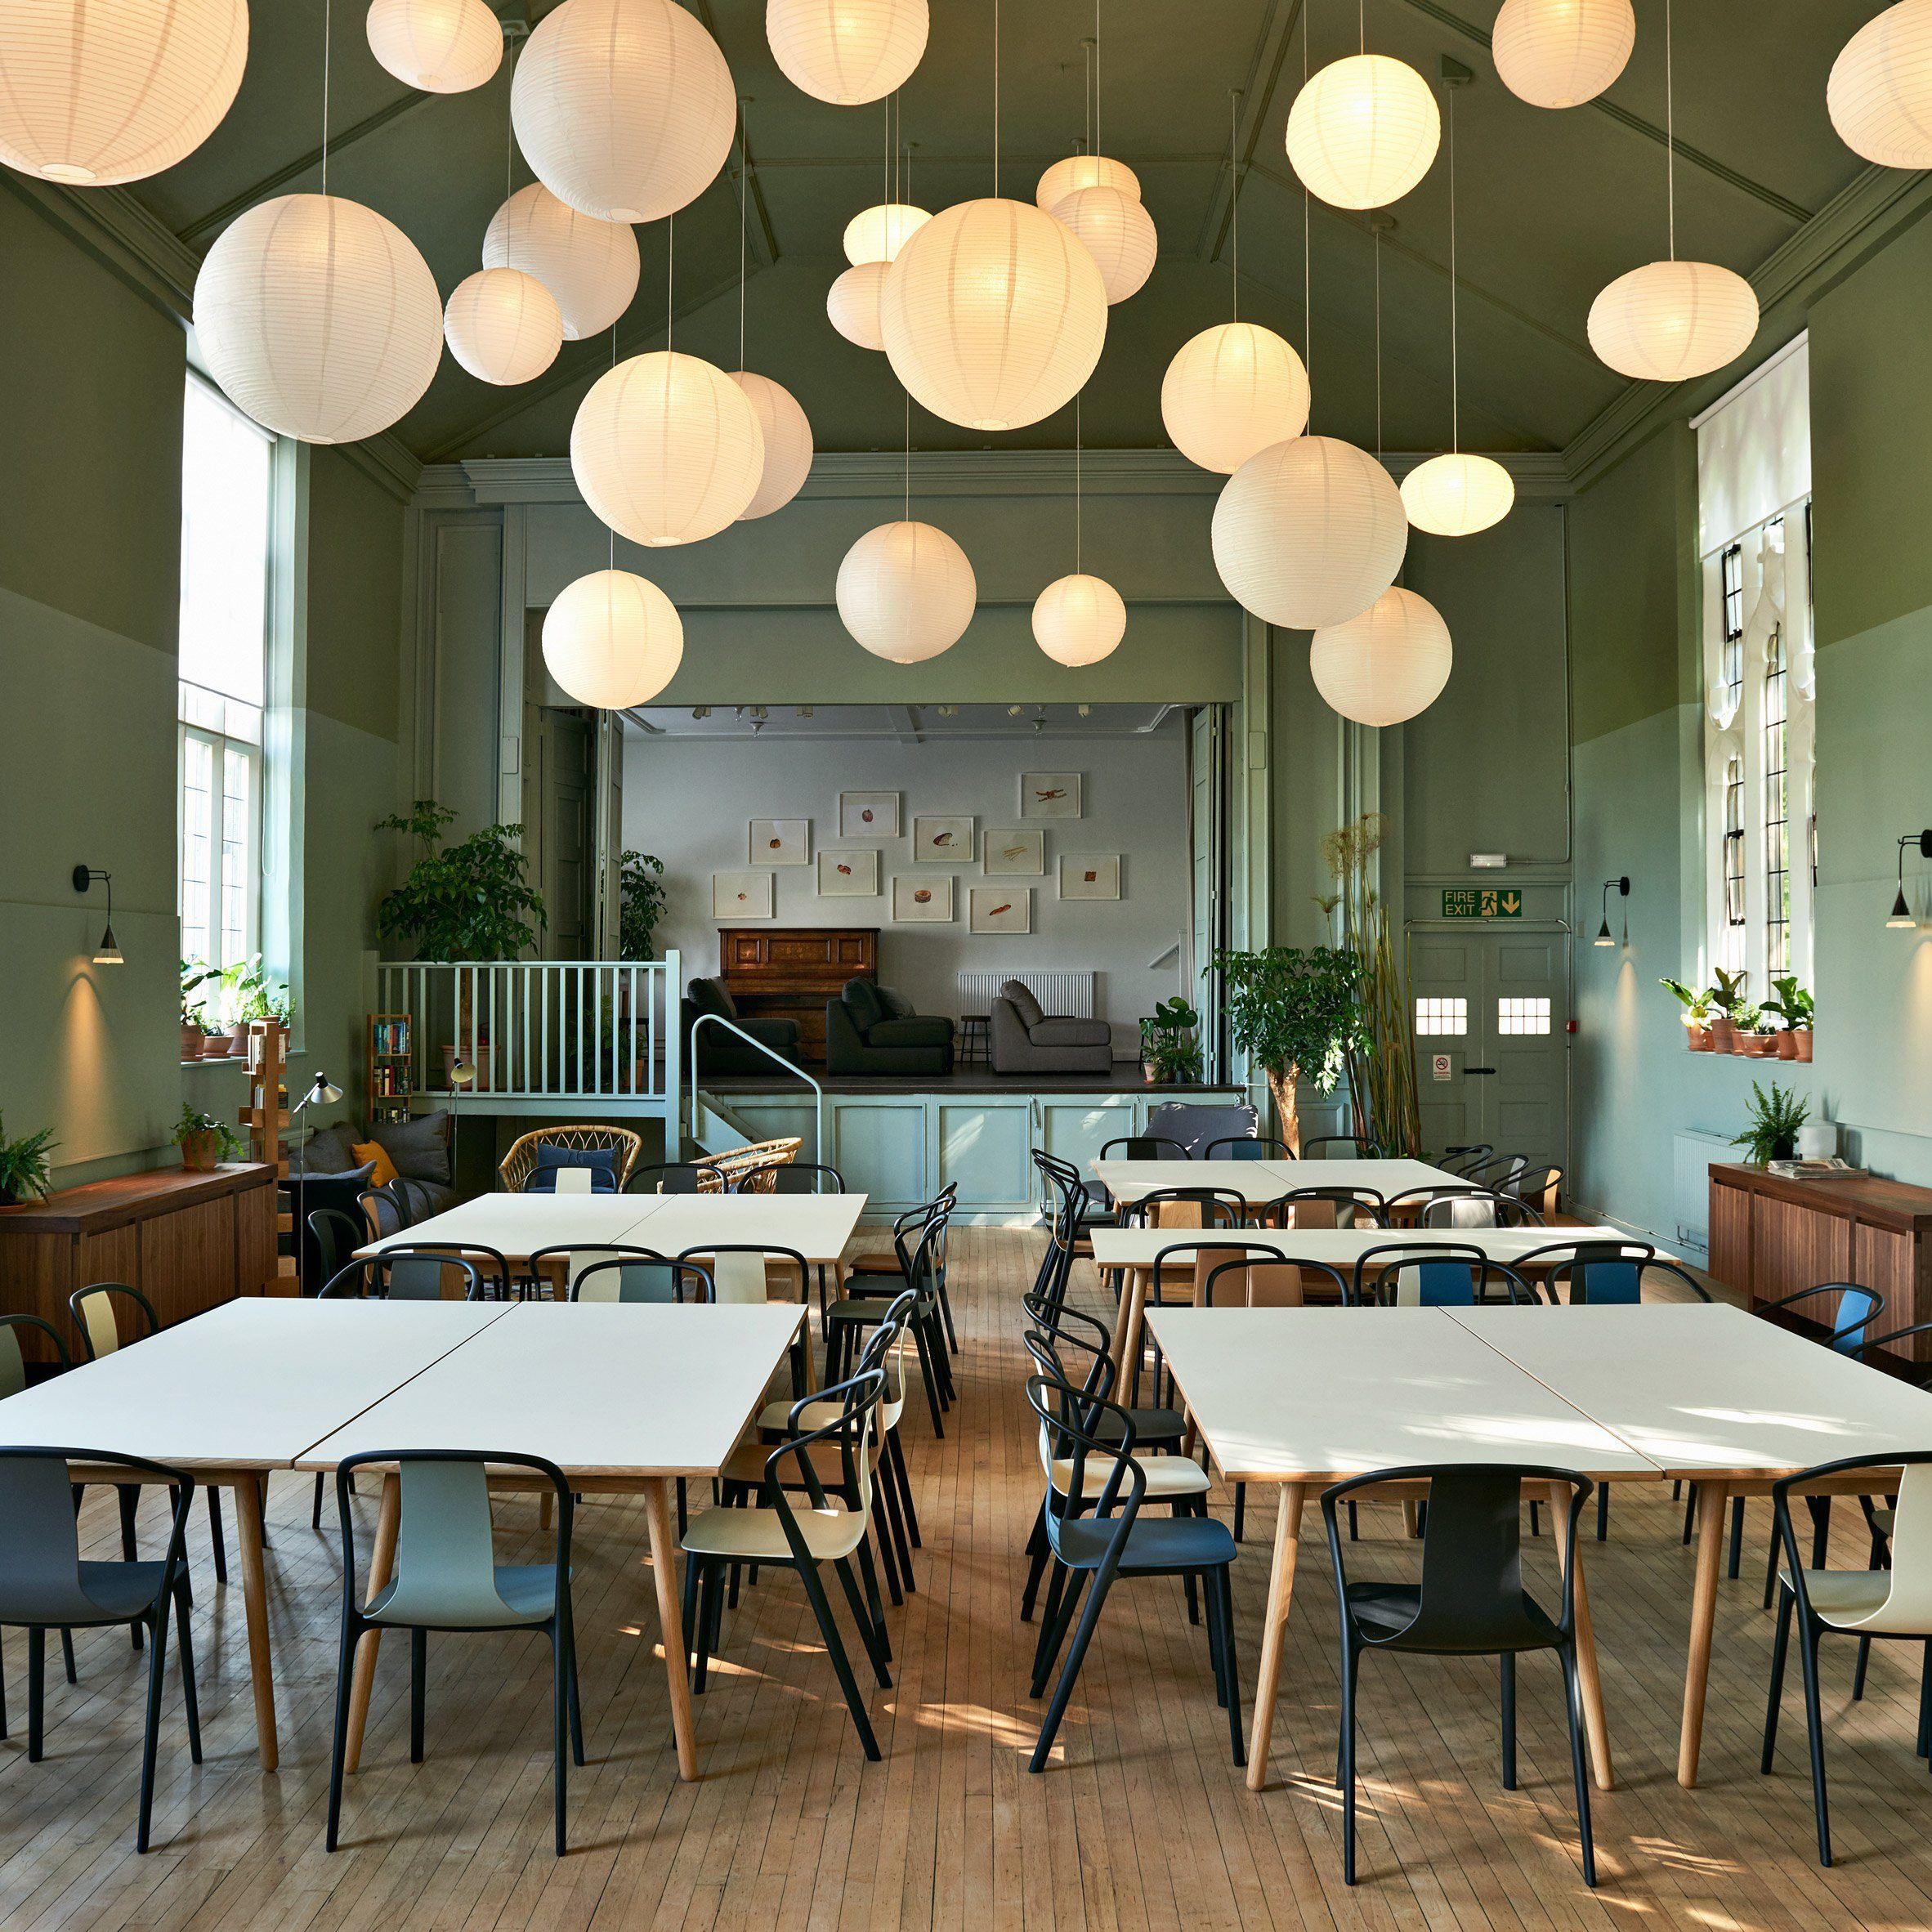 renowned chef massimo bottura has opened an ilse crawford-designed ... - Designer Chefmobel Moderne Buro